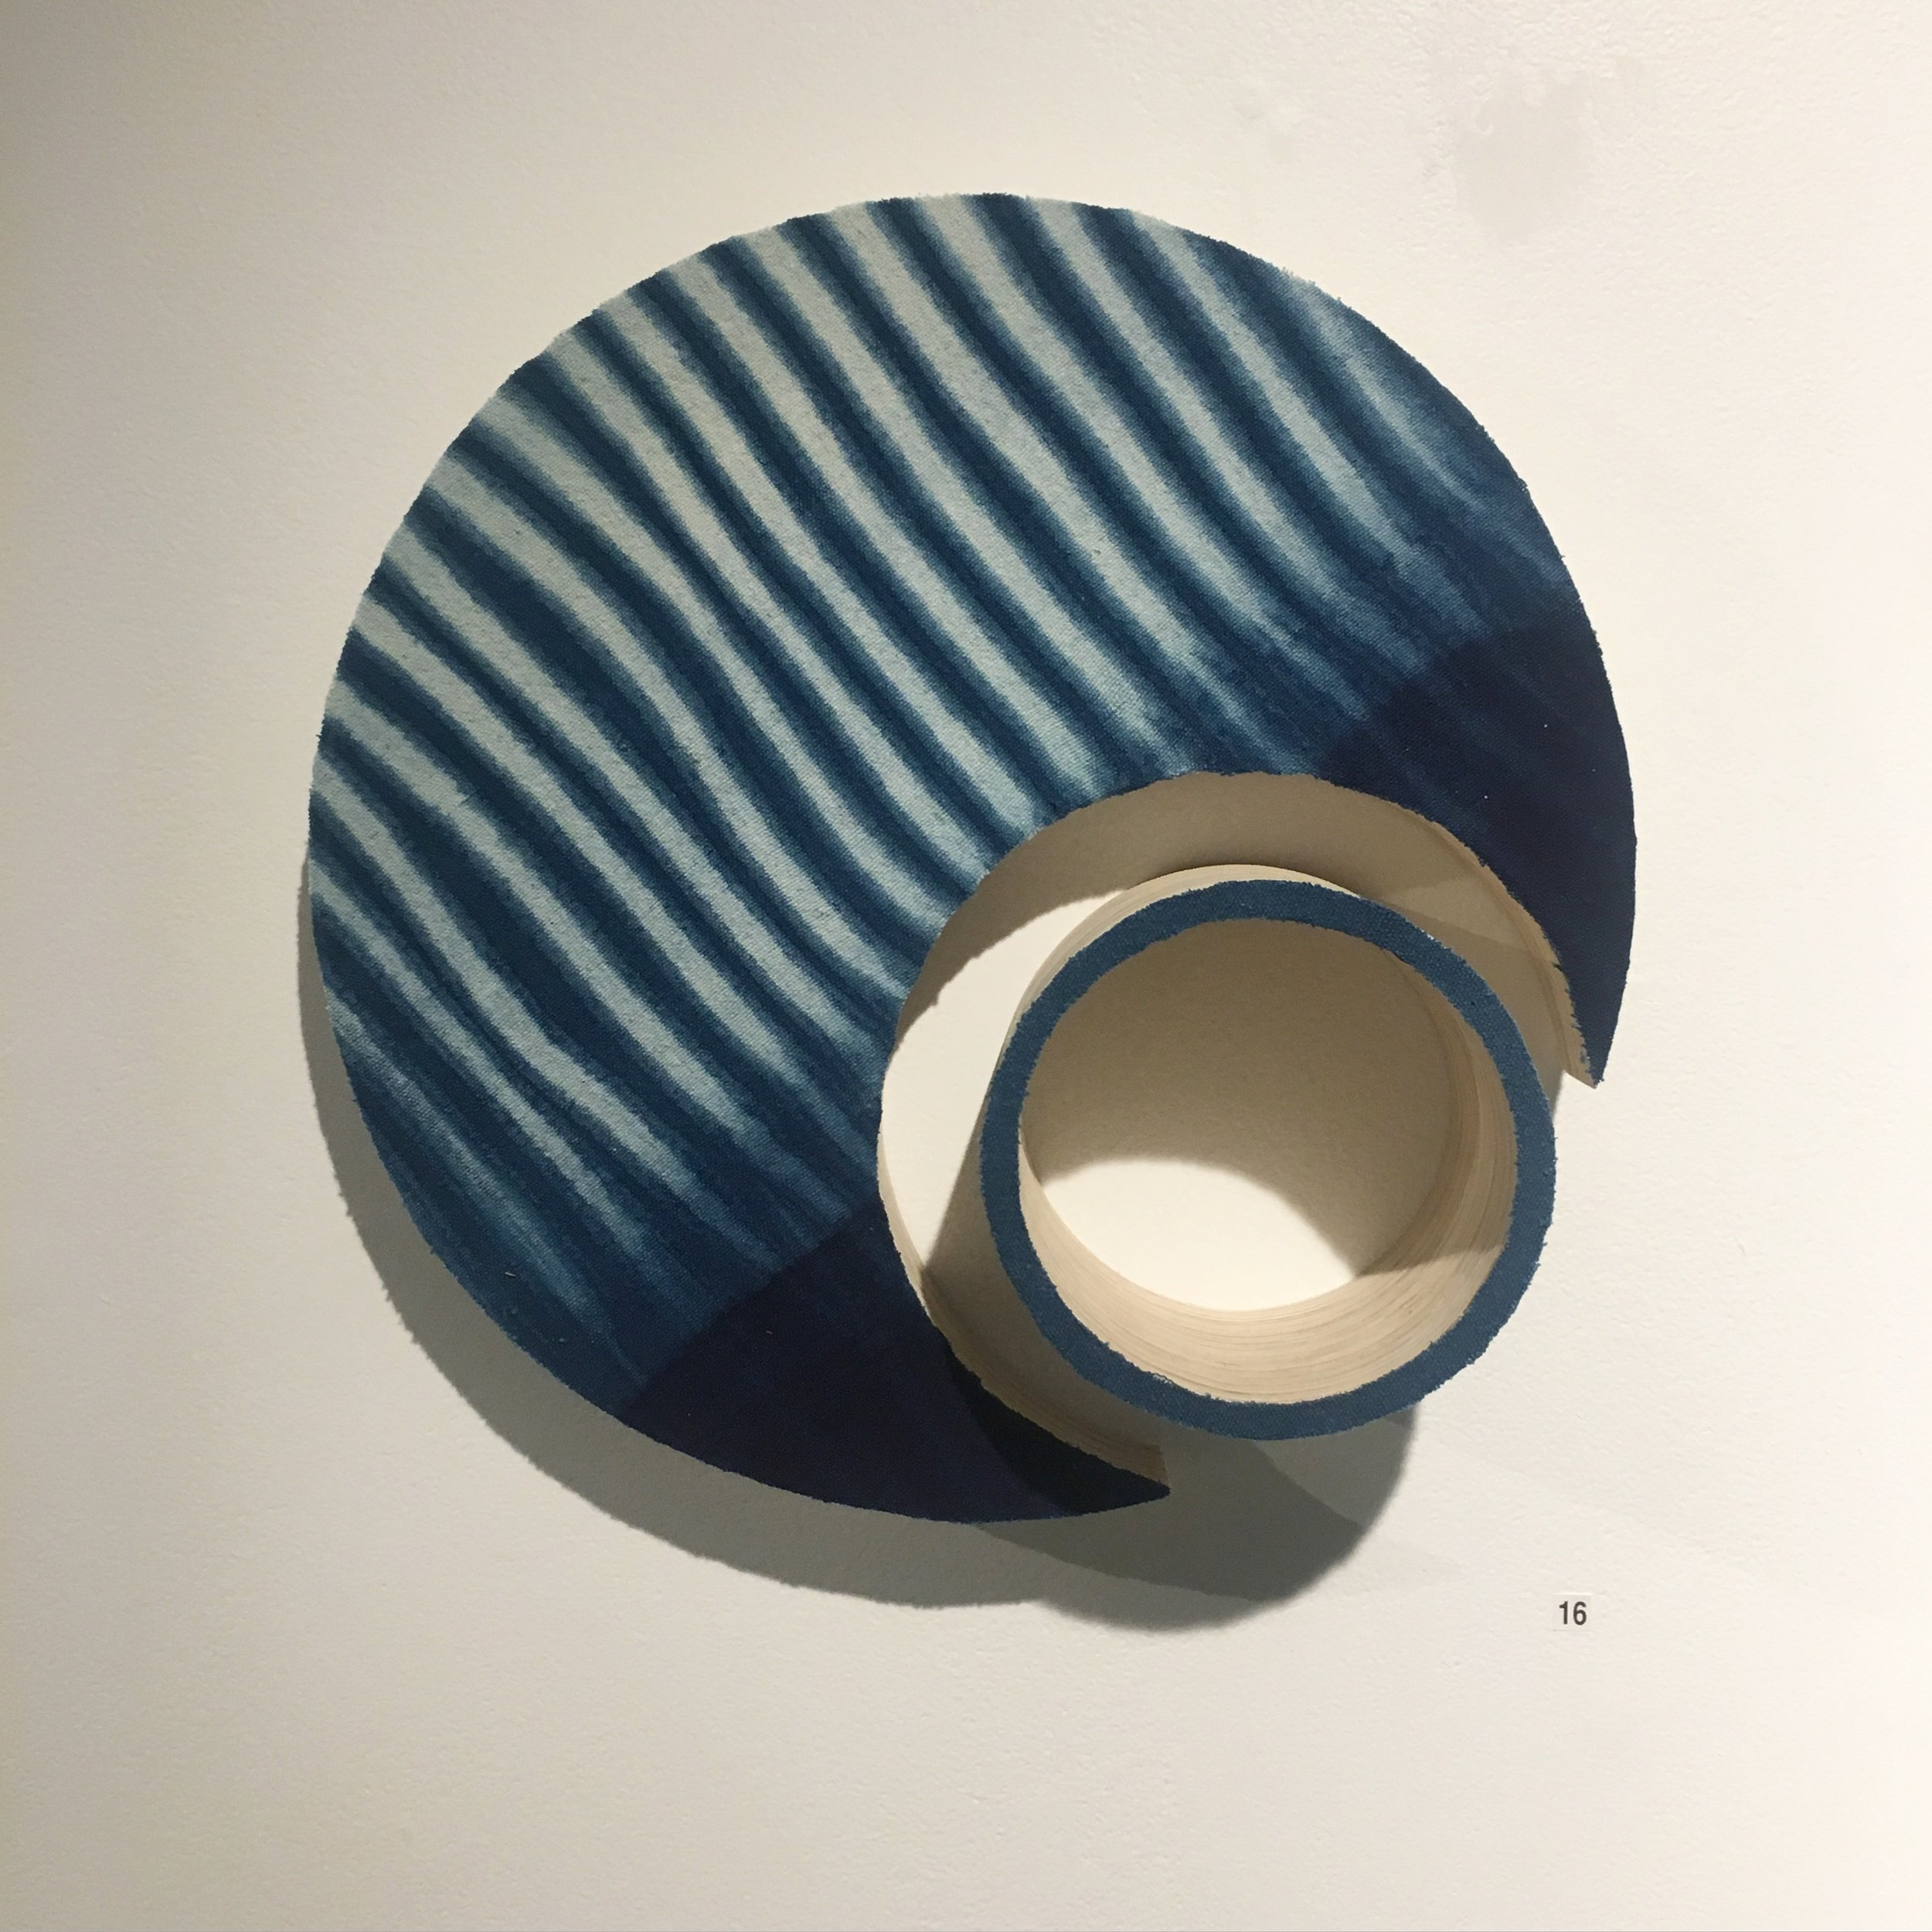 Indigo into the void and split    Indigo dyed linen mounted onto layered plywood 360 x 360 x 100